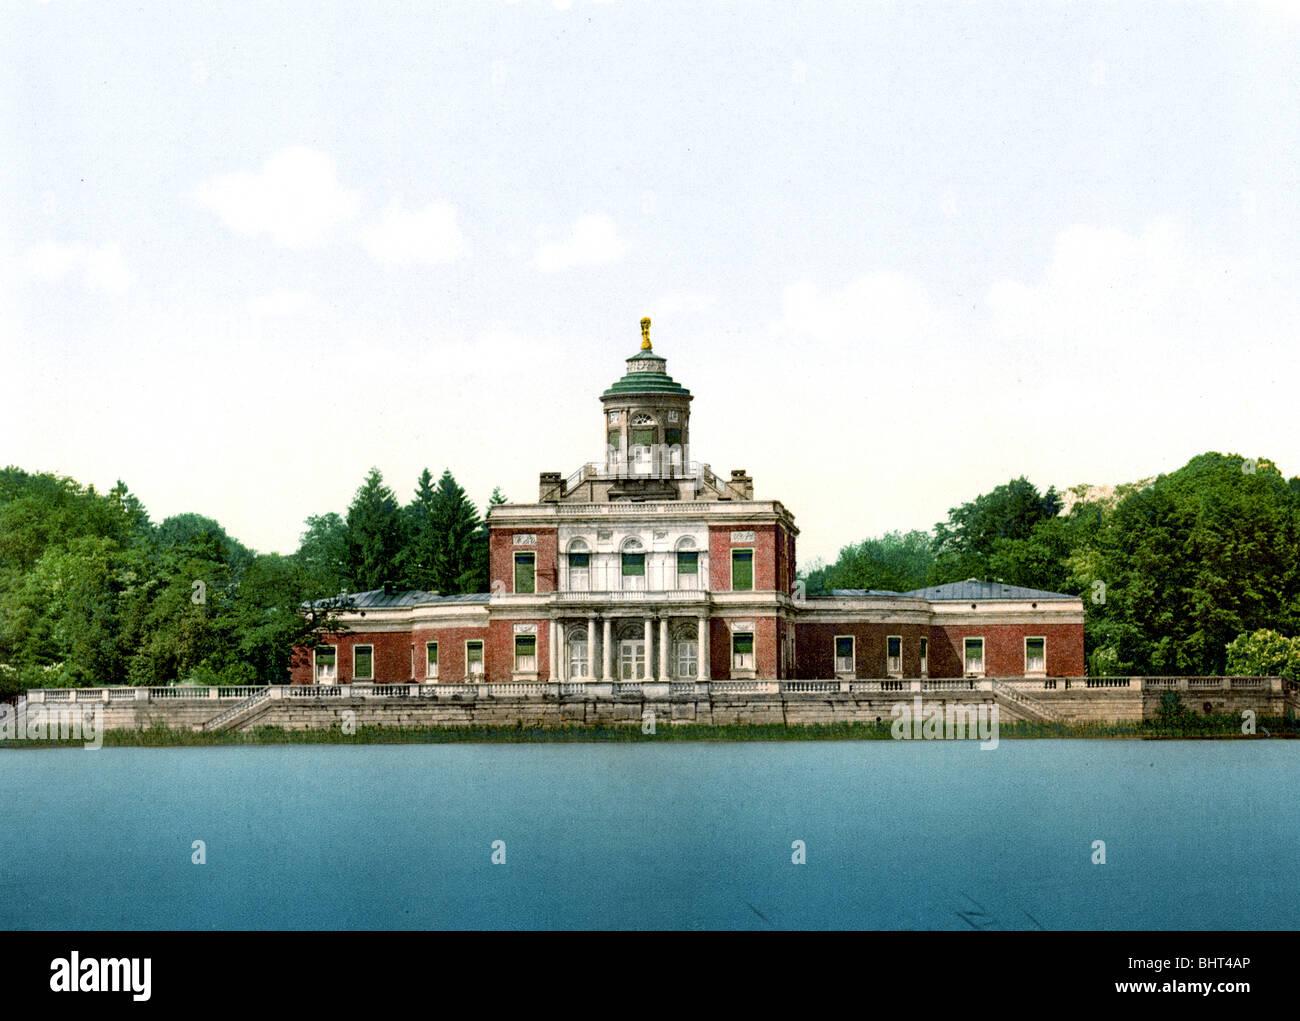 Marmorpalast Potsdam - Stock Image